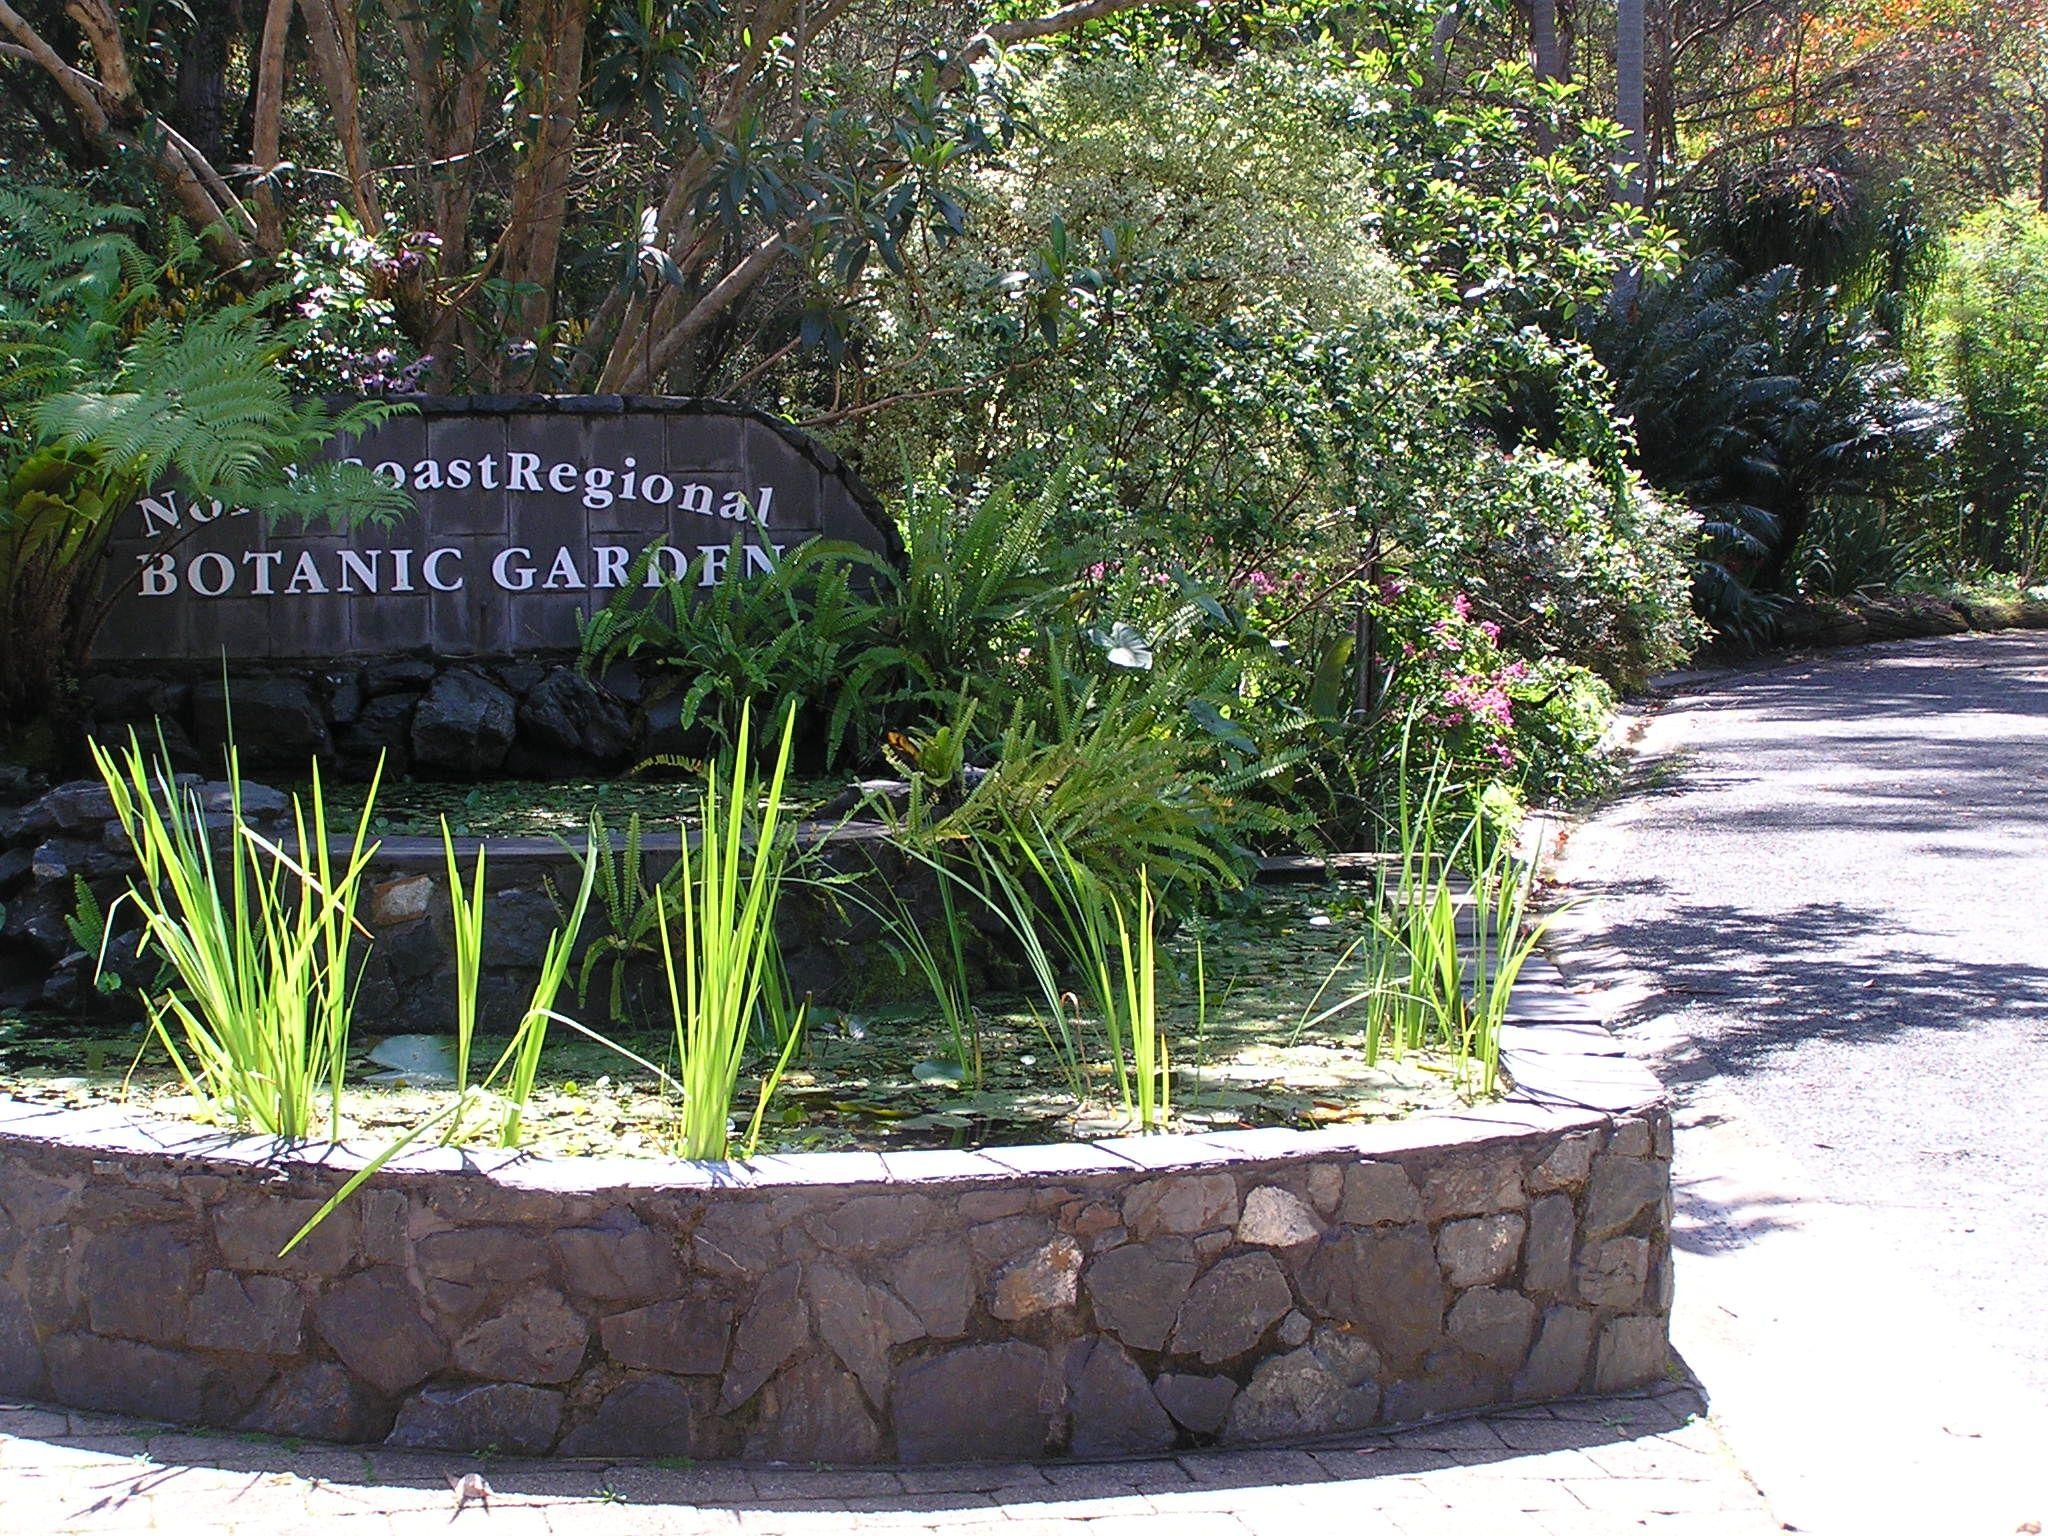 Botanic Garden entry sign